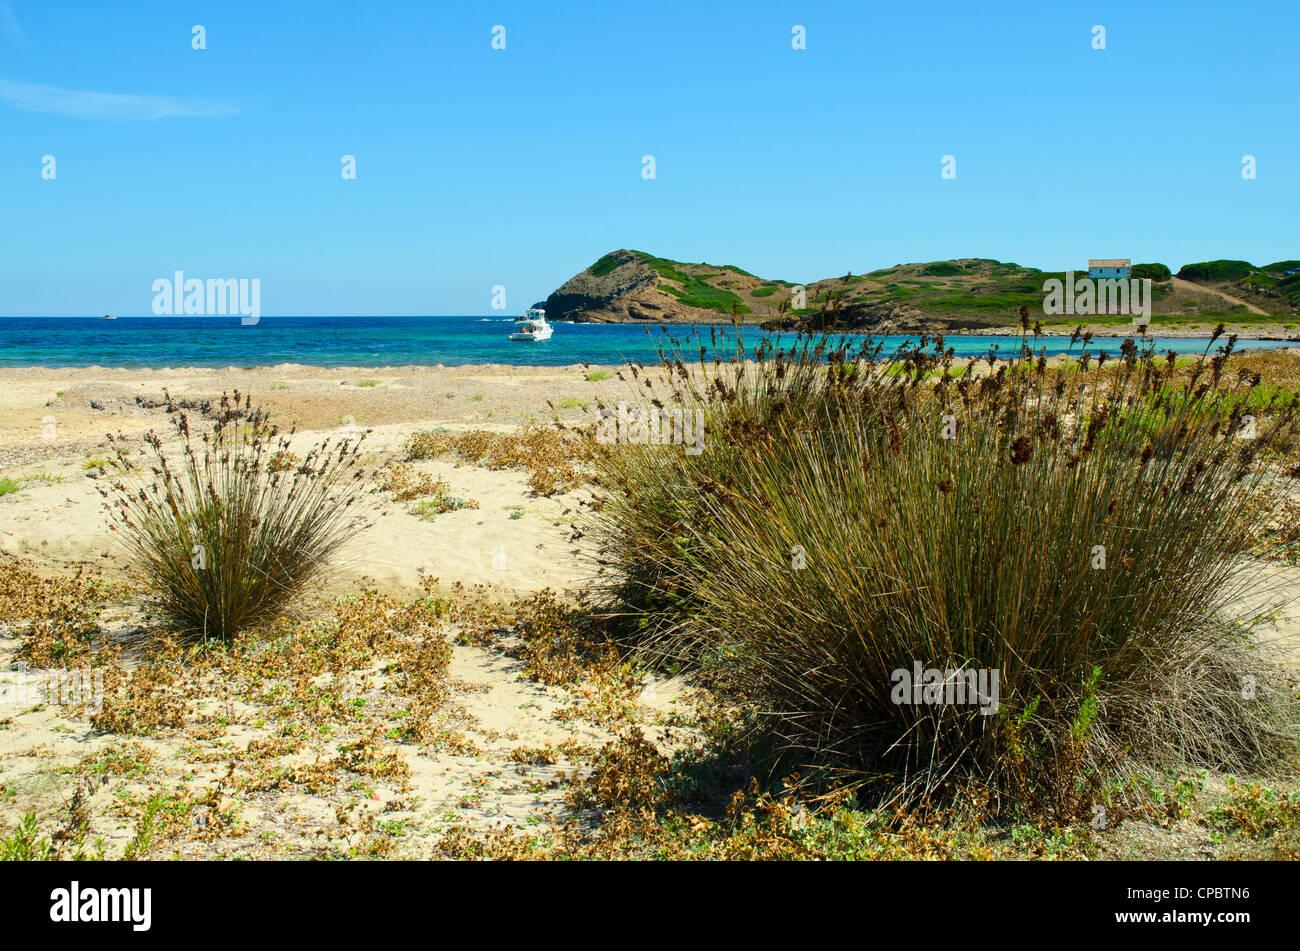 The bay of Cala de Sa Torreta on Menorca in the Balearic islands, Spain - Stock Image